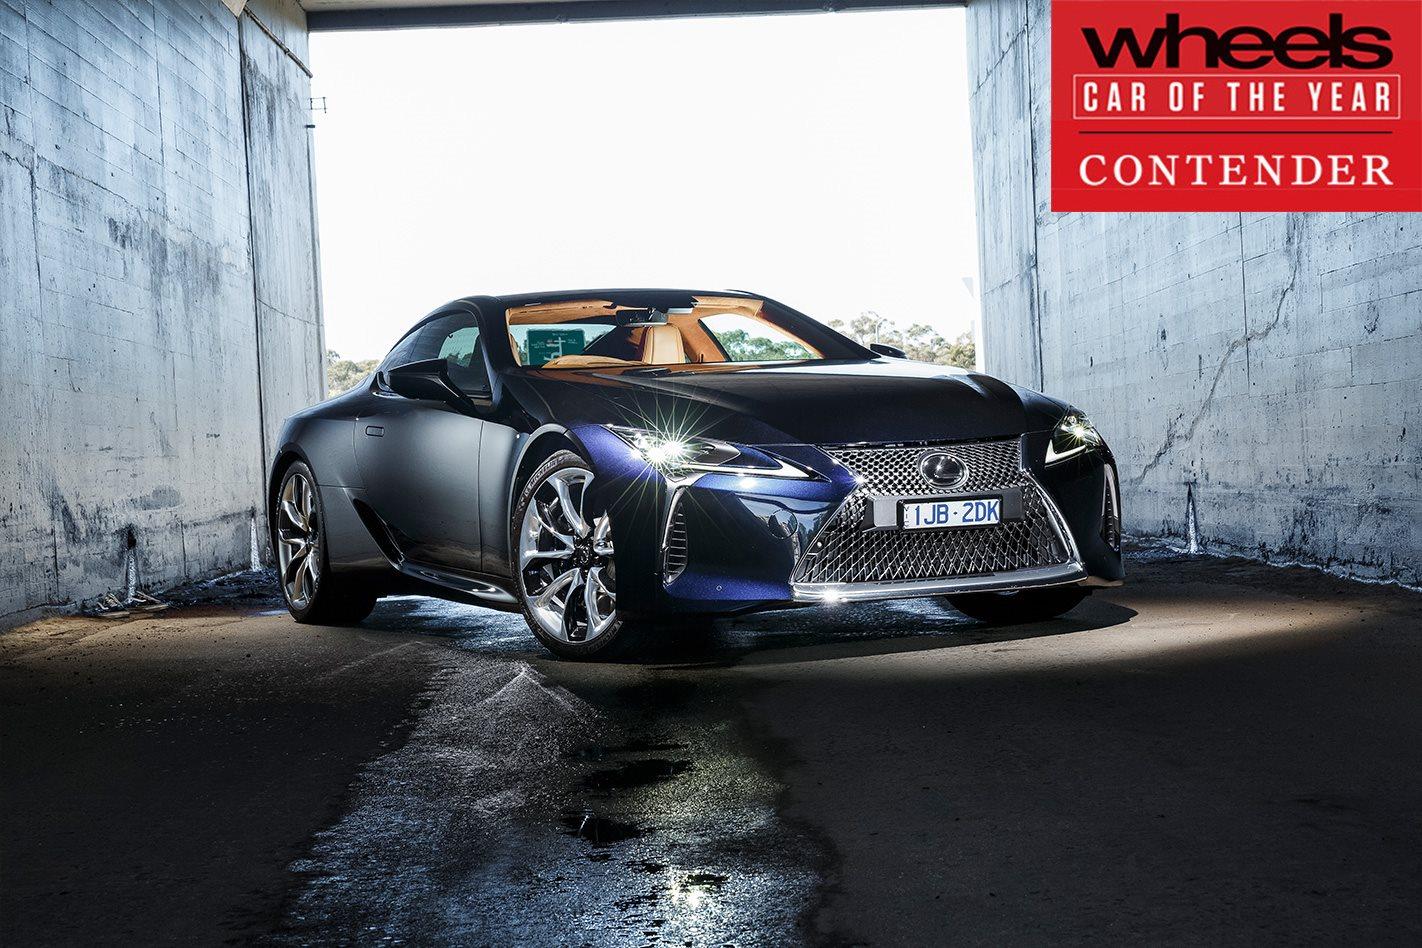 Circuito Kia 2018 : Lexus lc car of the year review wheels